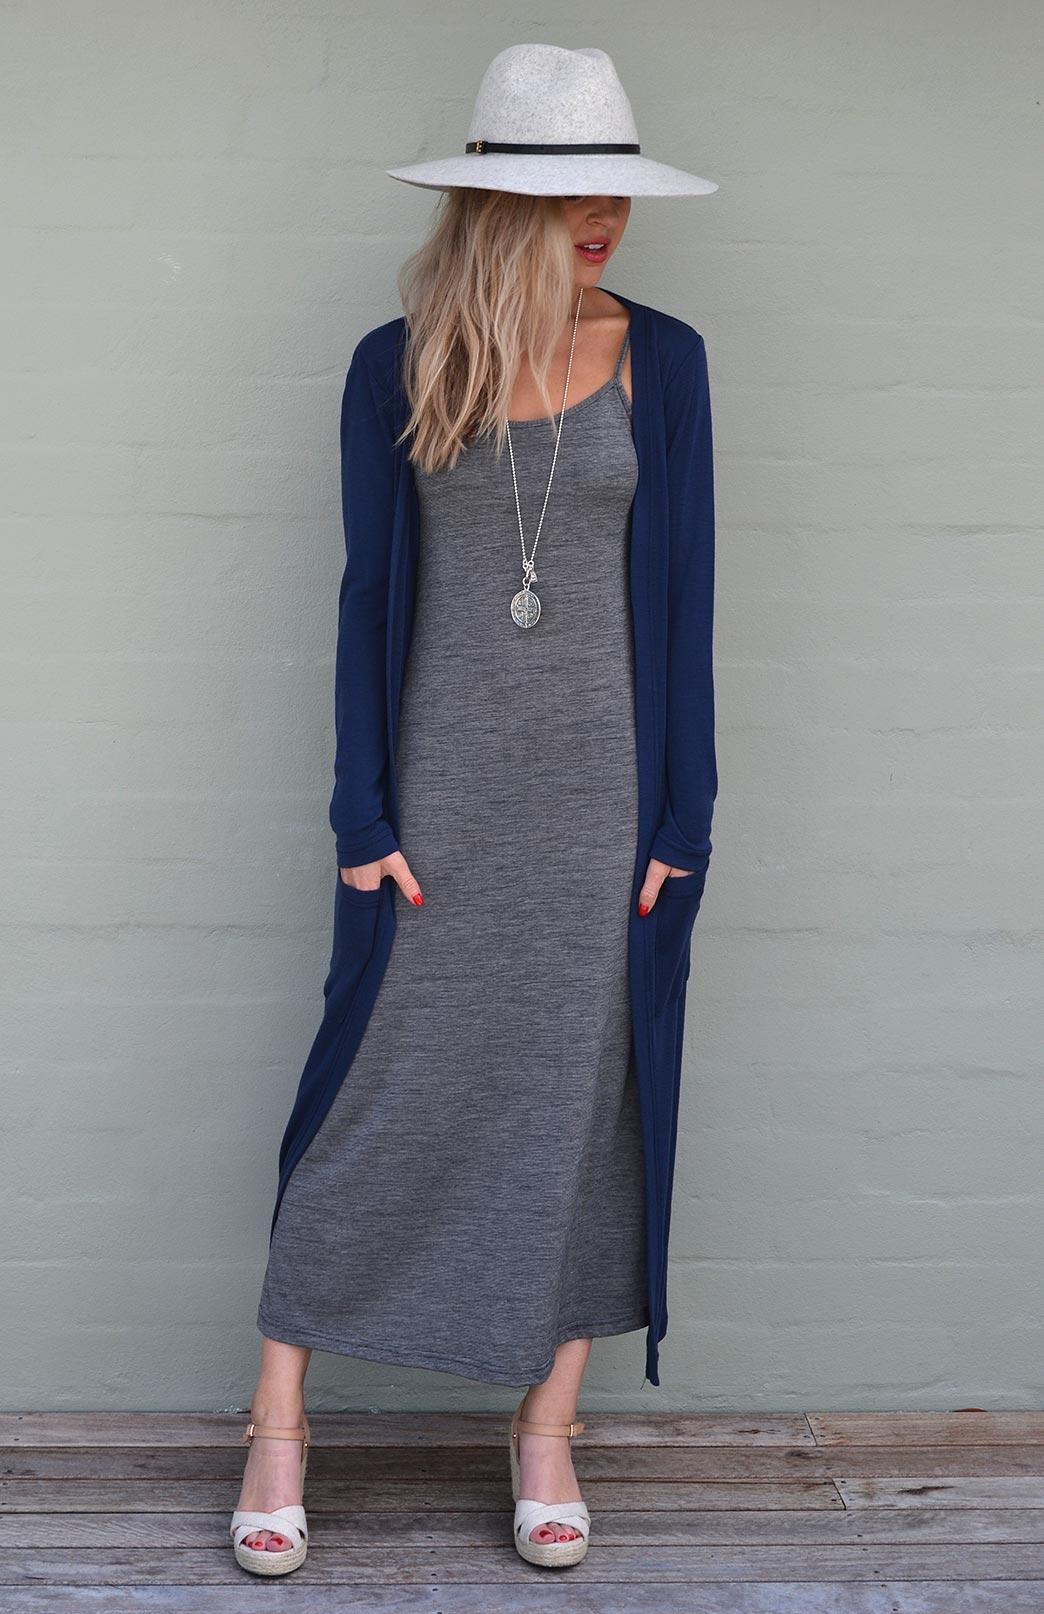 Organic Cotton/Merino Camisole Maxi Dress - Smitten Merino Tasmania Australia